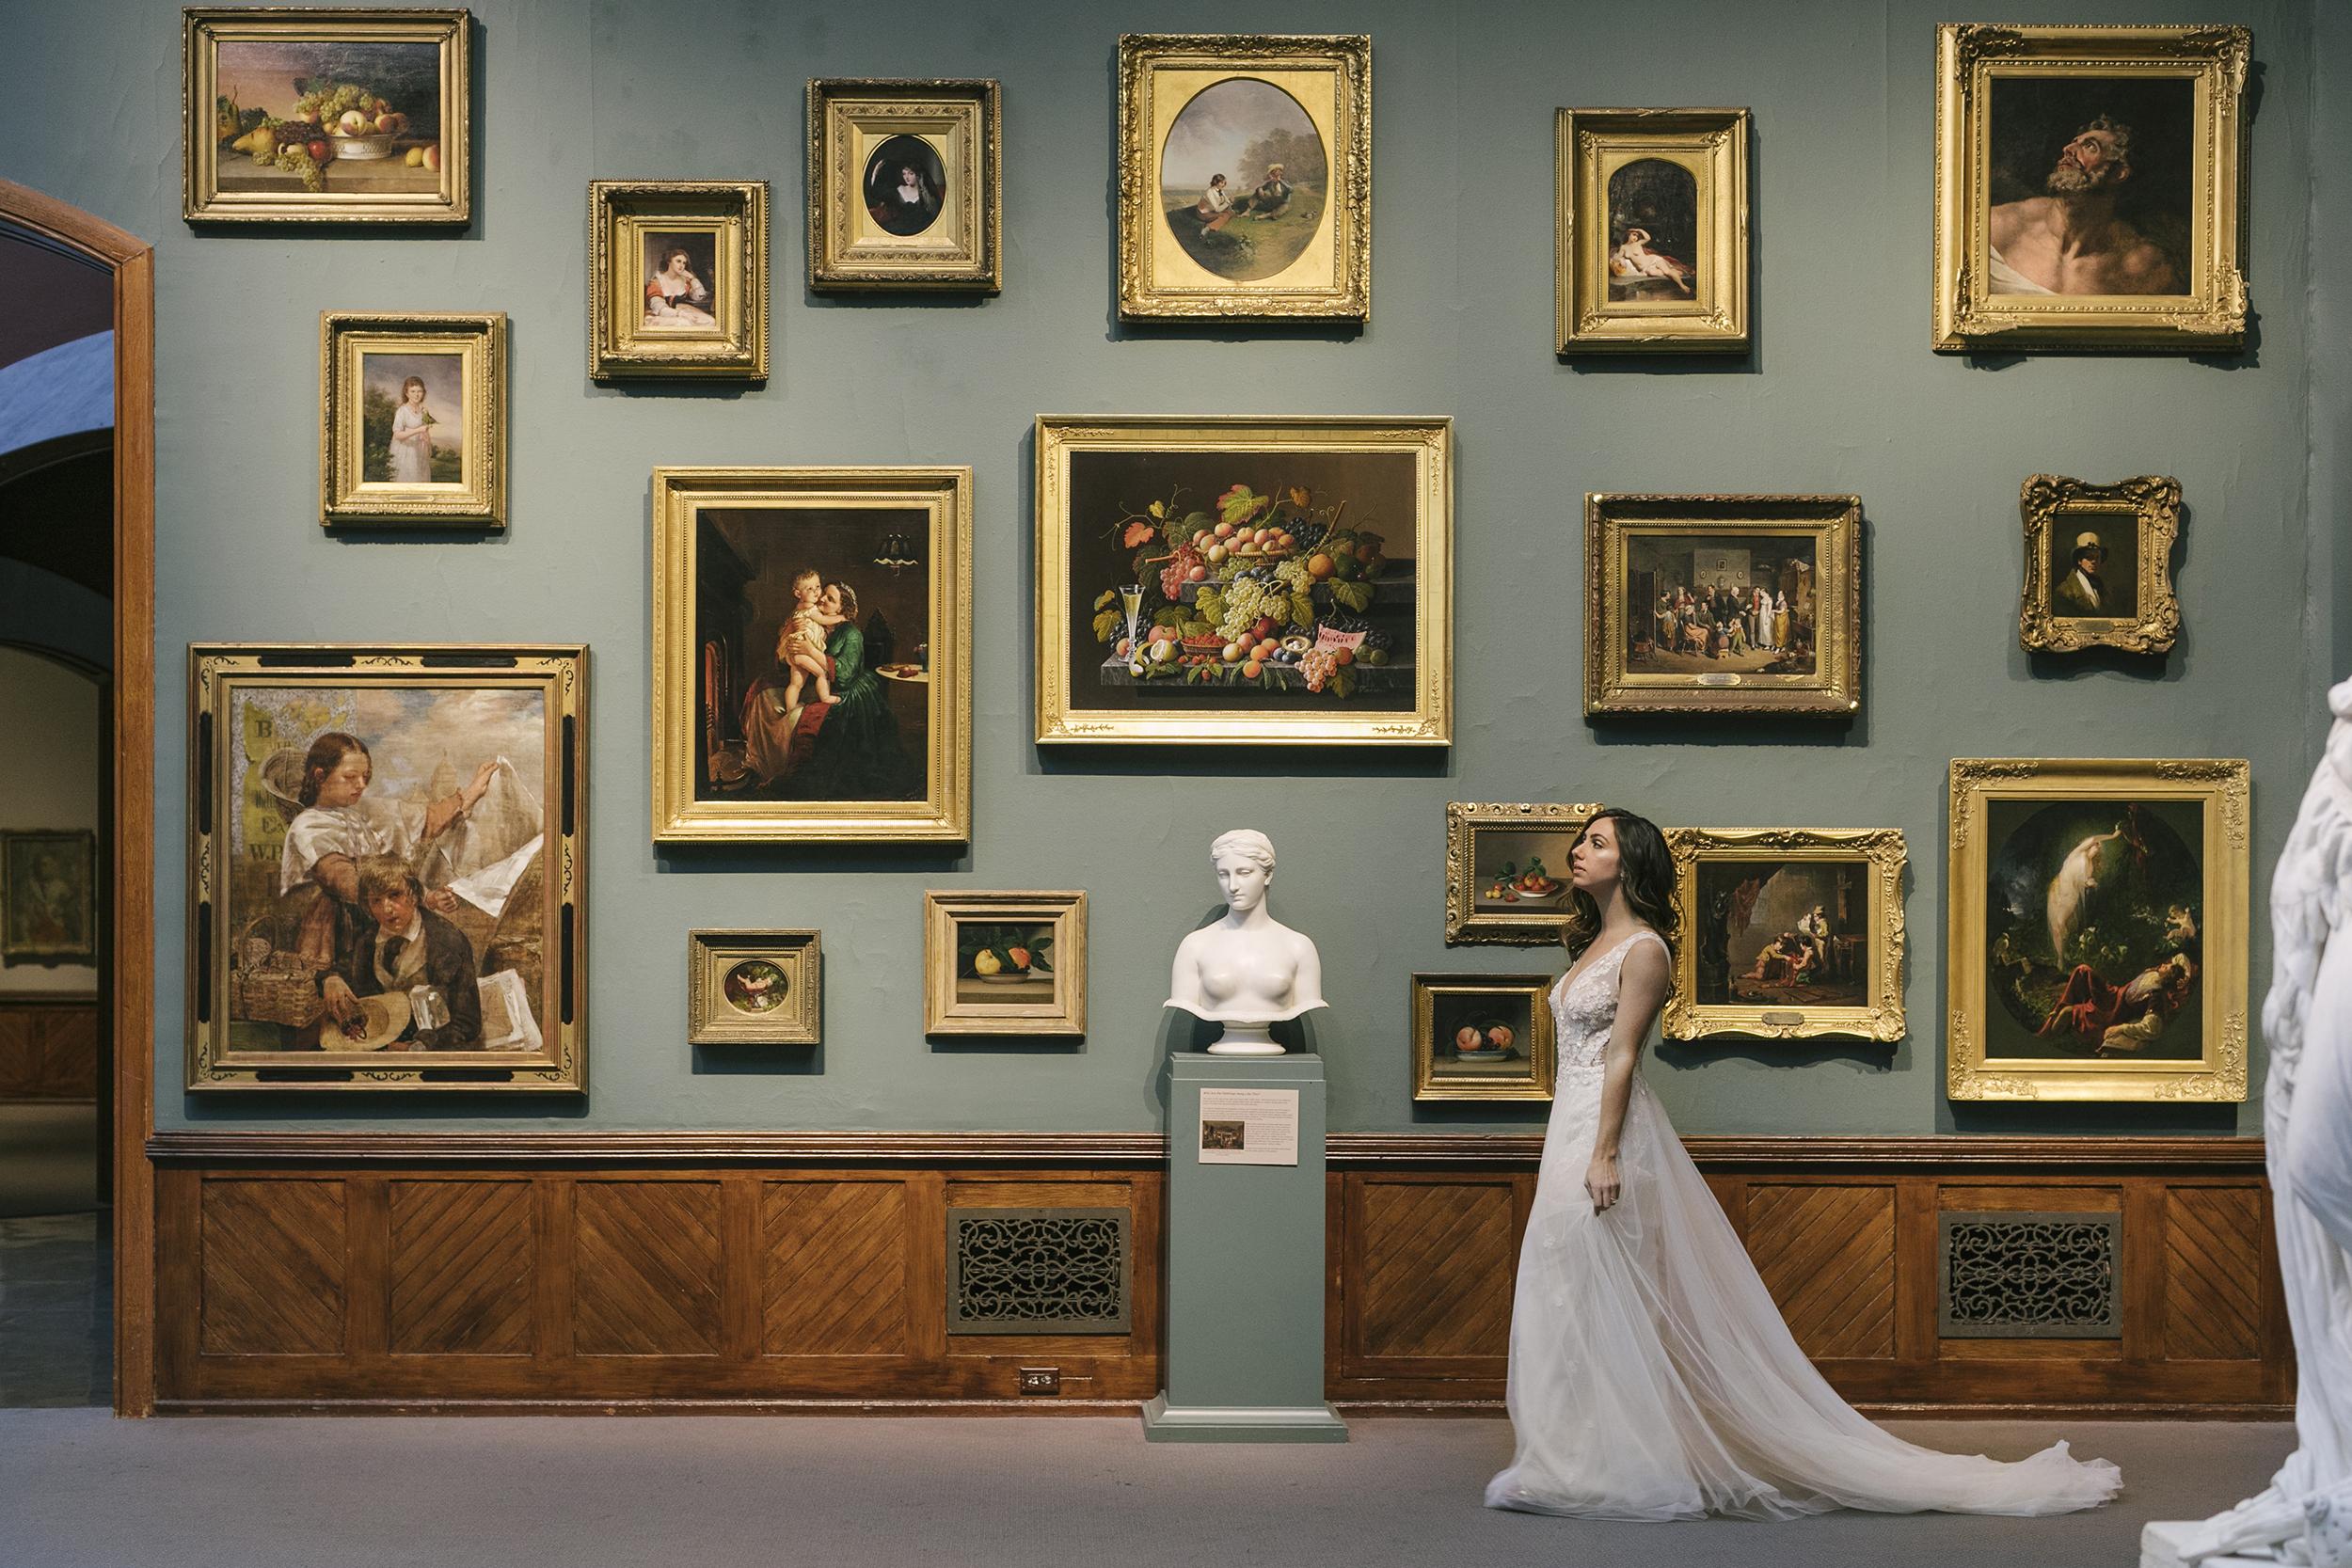 photography-wedding-weddings-natural-candid-pafa-pennsylvania academy-philadephia-philly-philadelphia wedding-mixed race-editorial-modern-fine-art-011.JPG